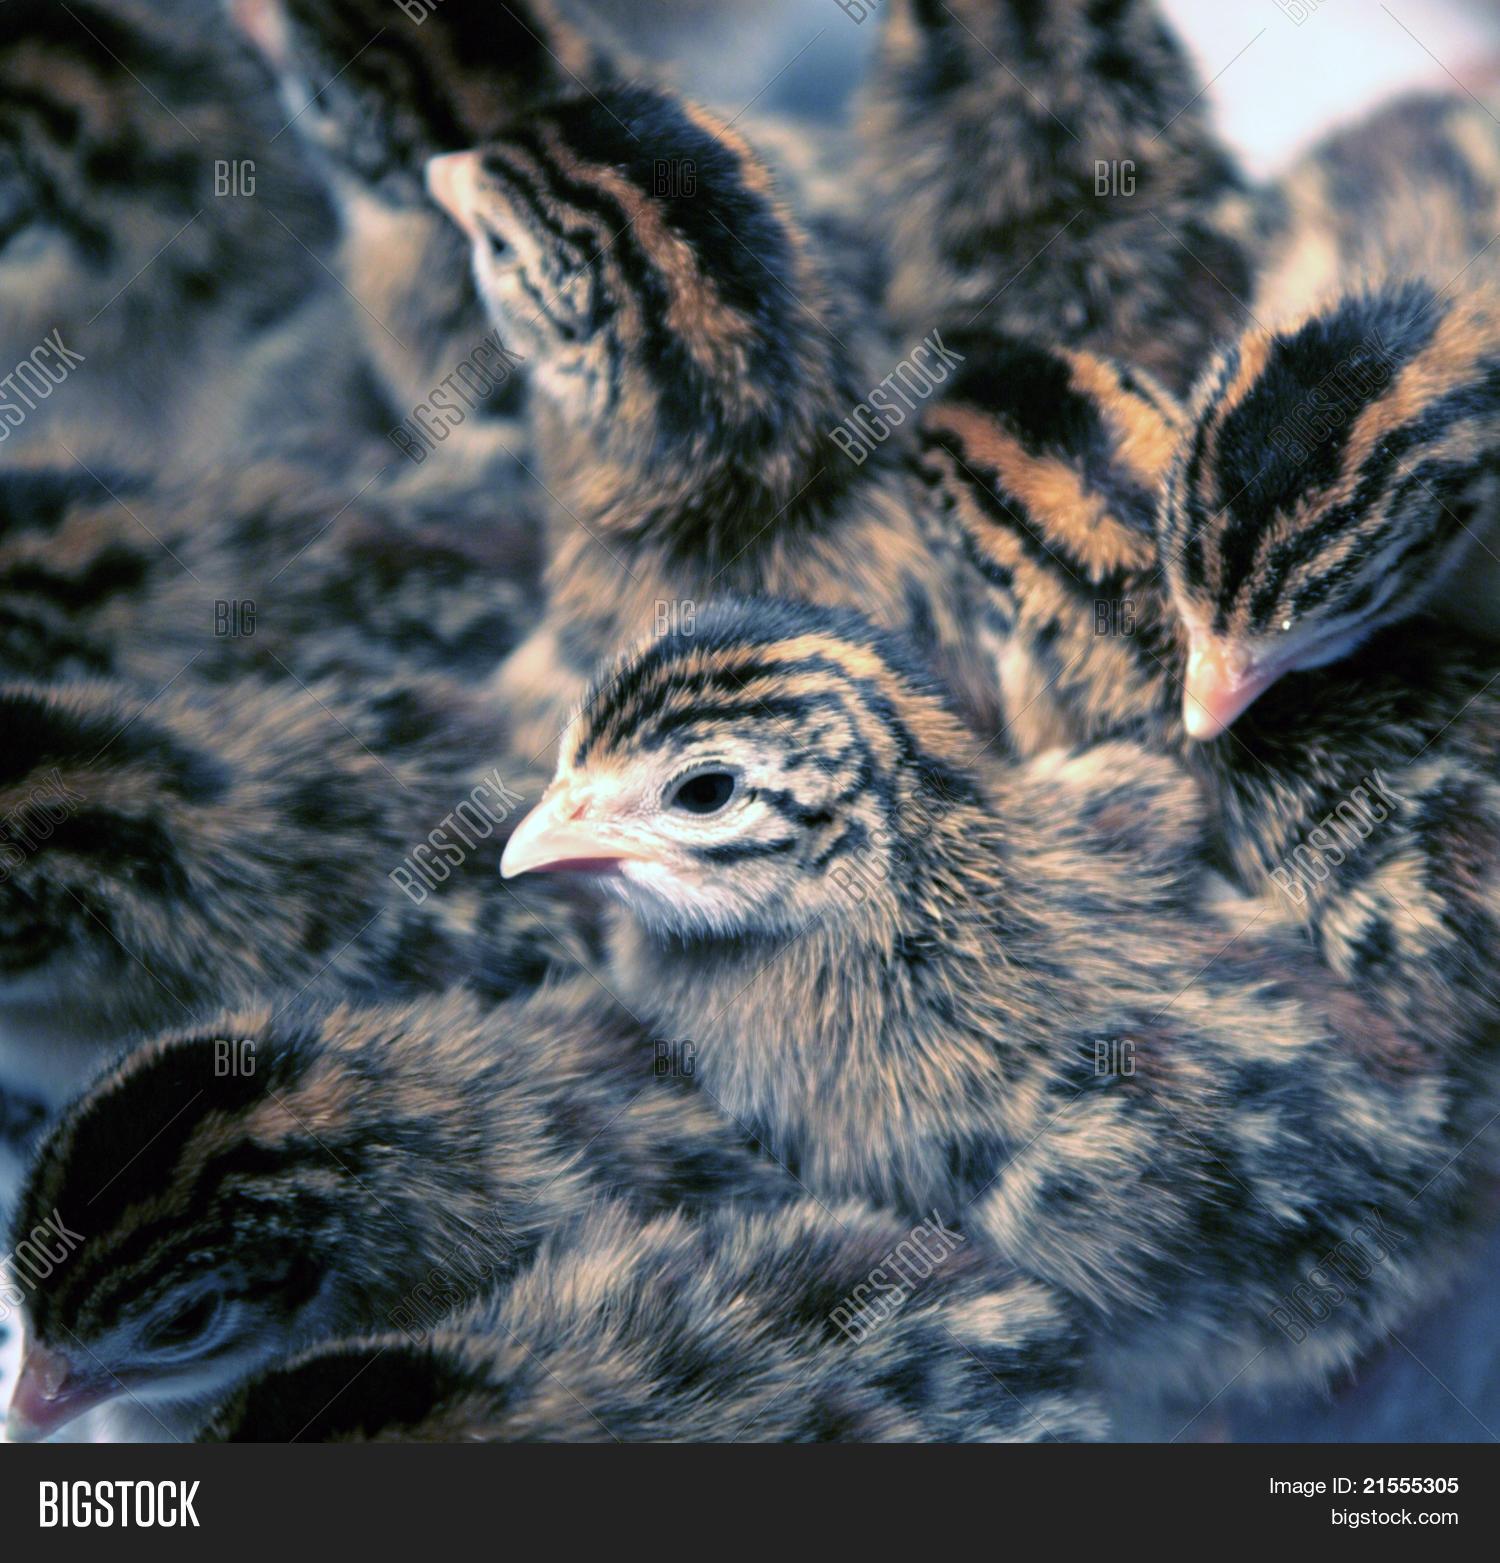 Newborn Guinea Fowl Image Photo Free Trial Bigstock